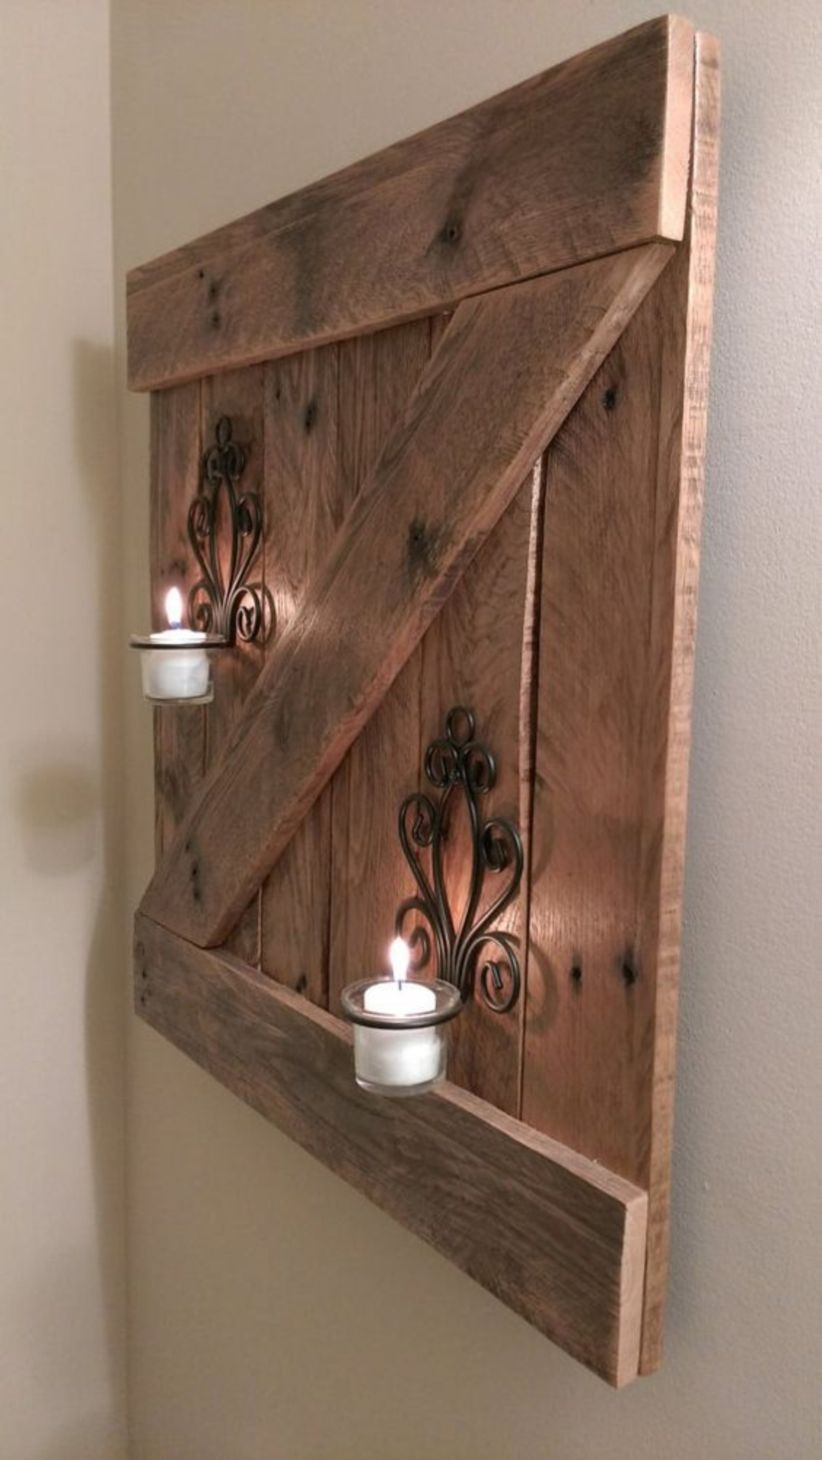 Rustic reclaimed wood barn door wall hanging